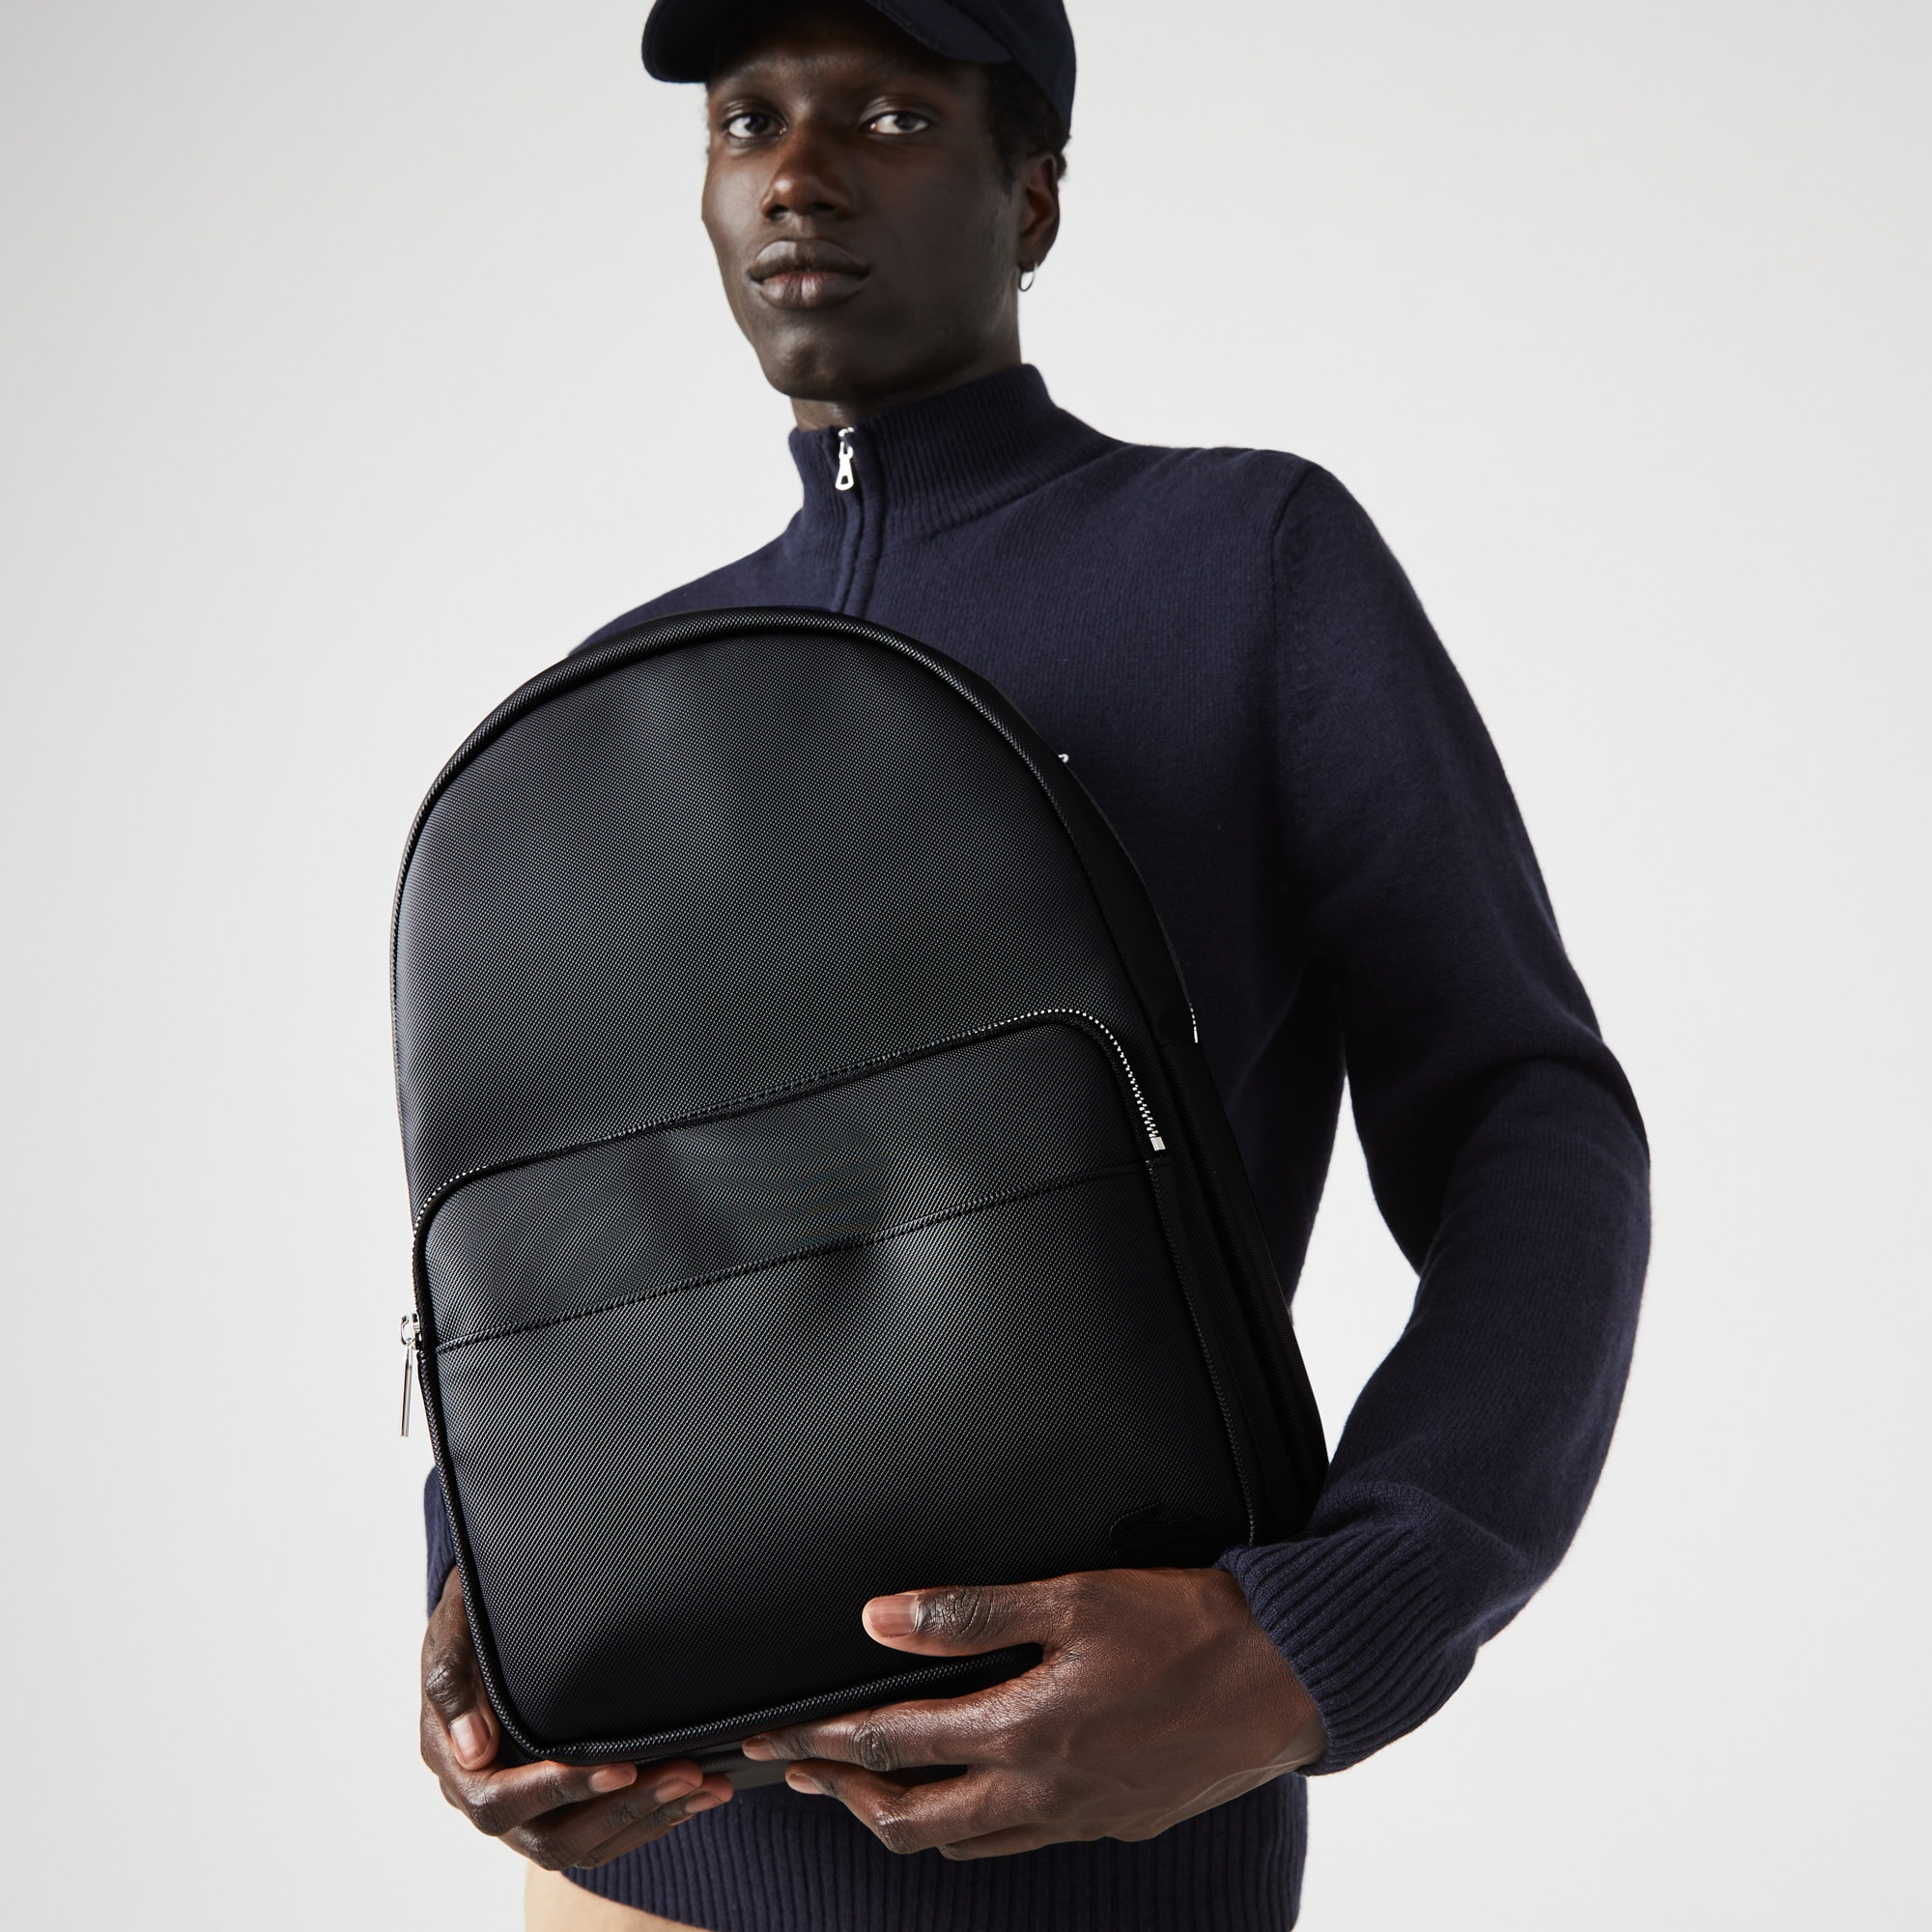 Leather goods for men   Men s Collection   LACOSTE cb3a4189d4